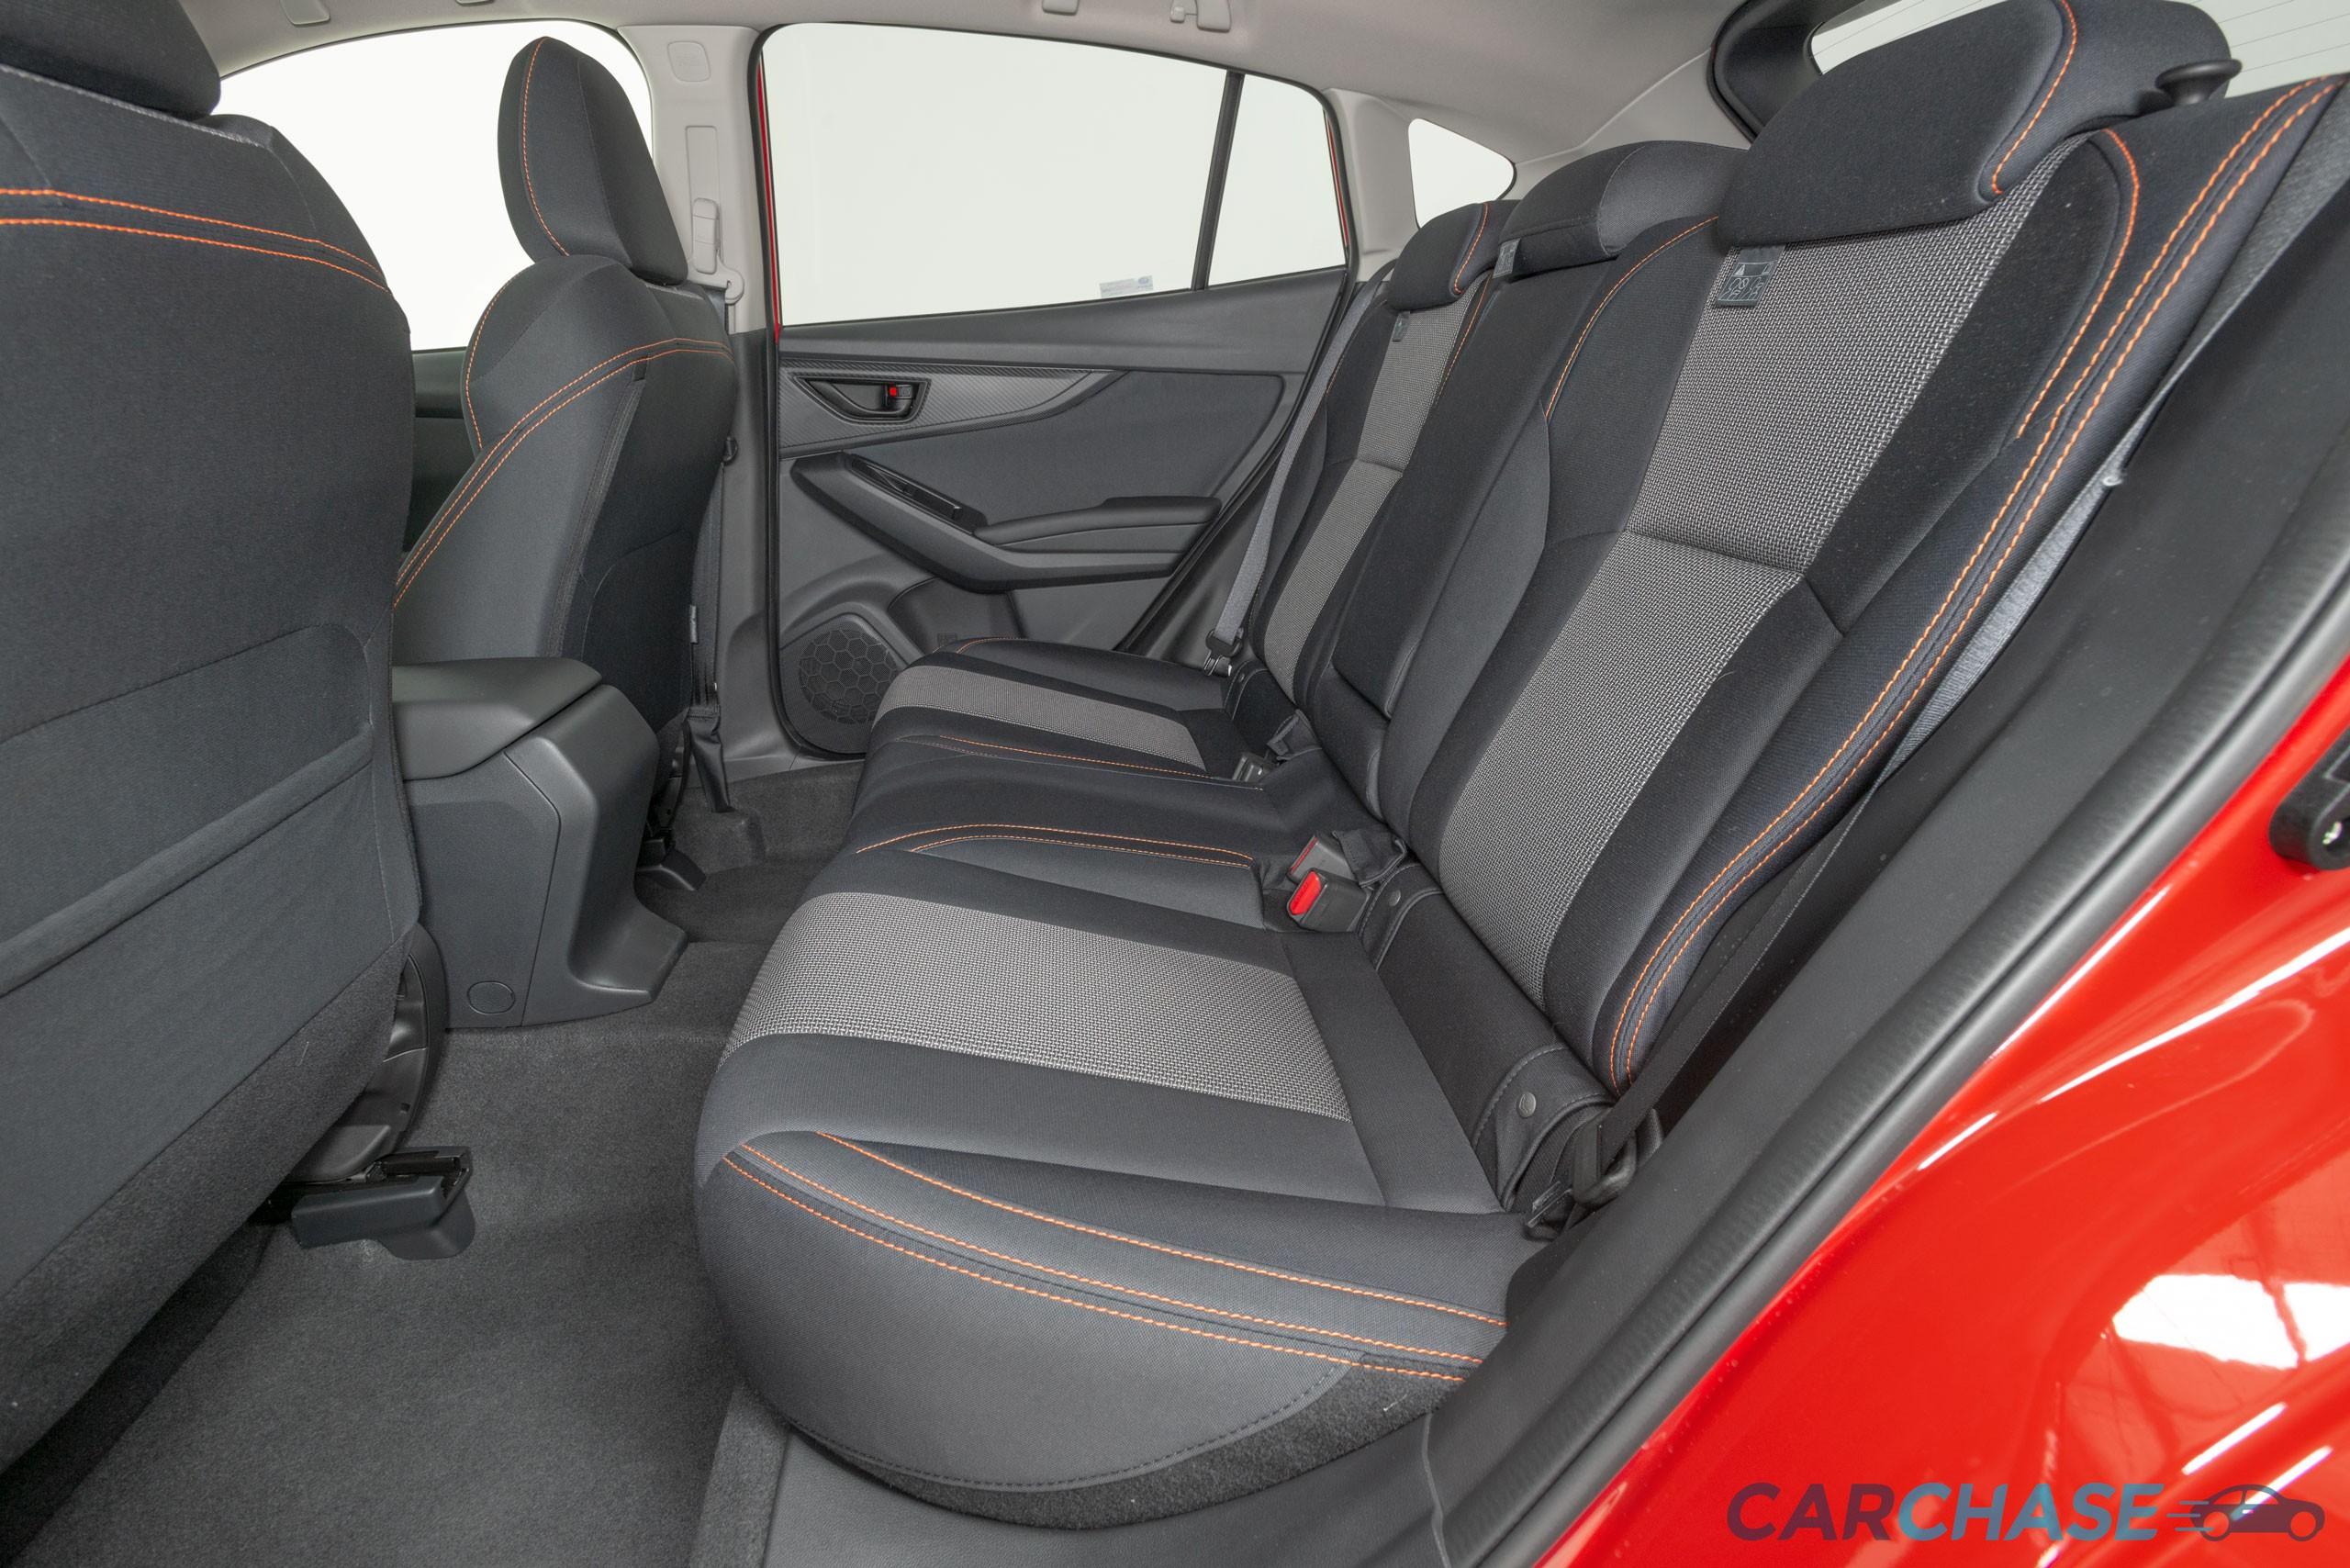 Image of passenger rear profile of 2018 Subaru XV 2.0i